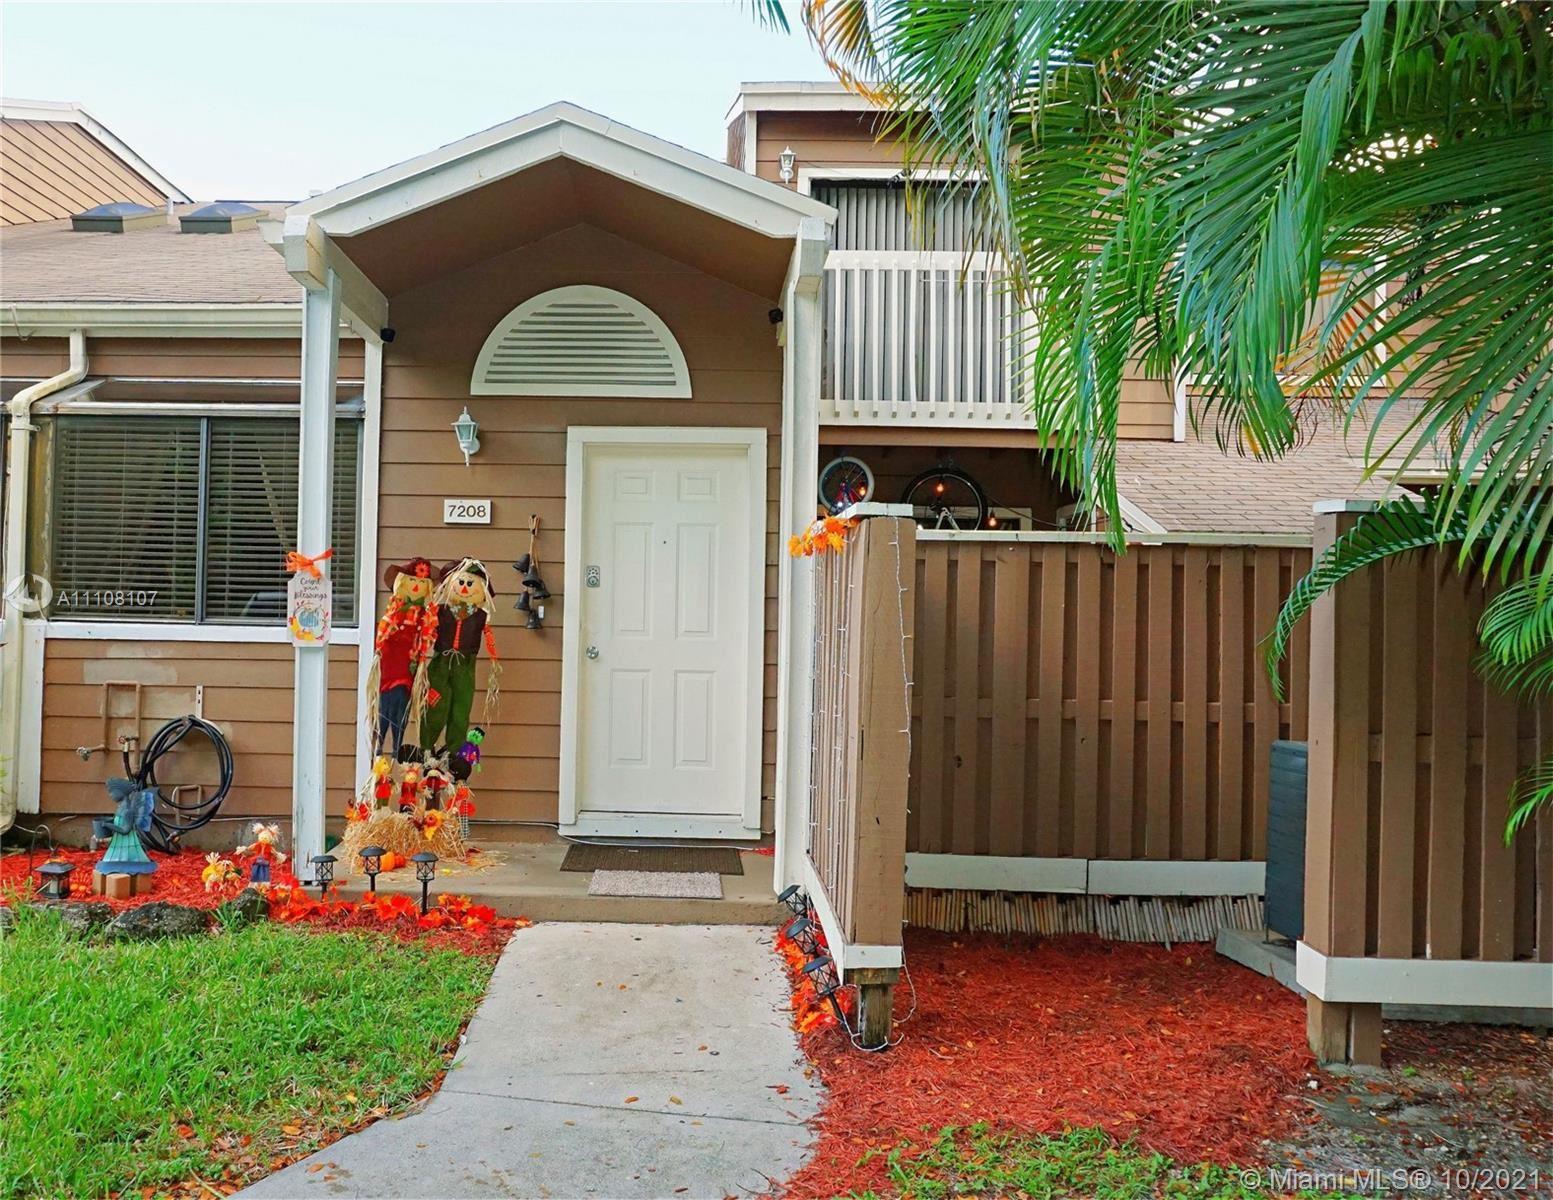 Photo of 7208 Sportsmans Dr #7208, North Lauderdale, FL 33068 (MLS # A11108107)